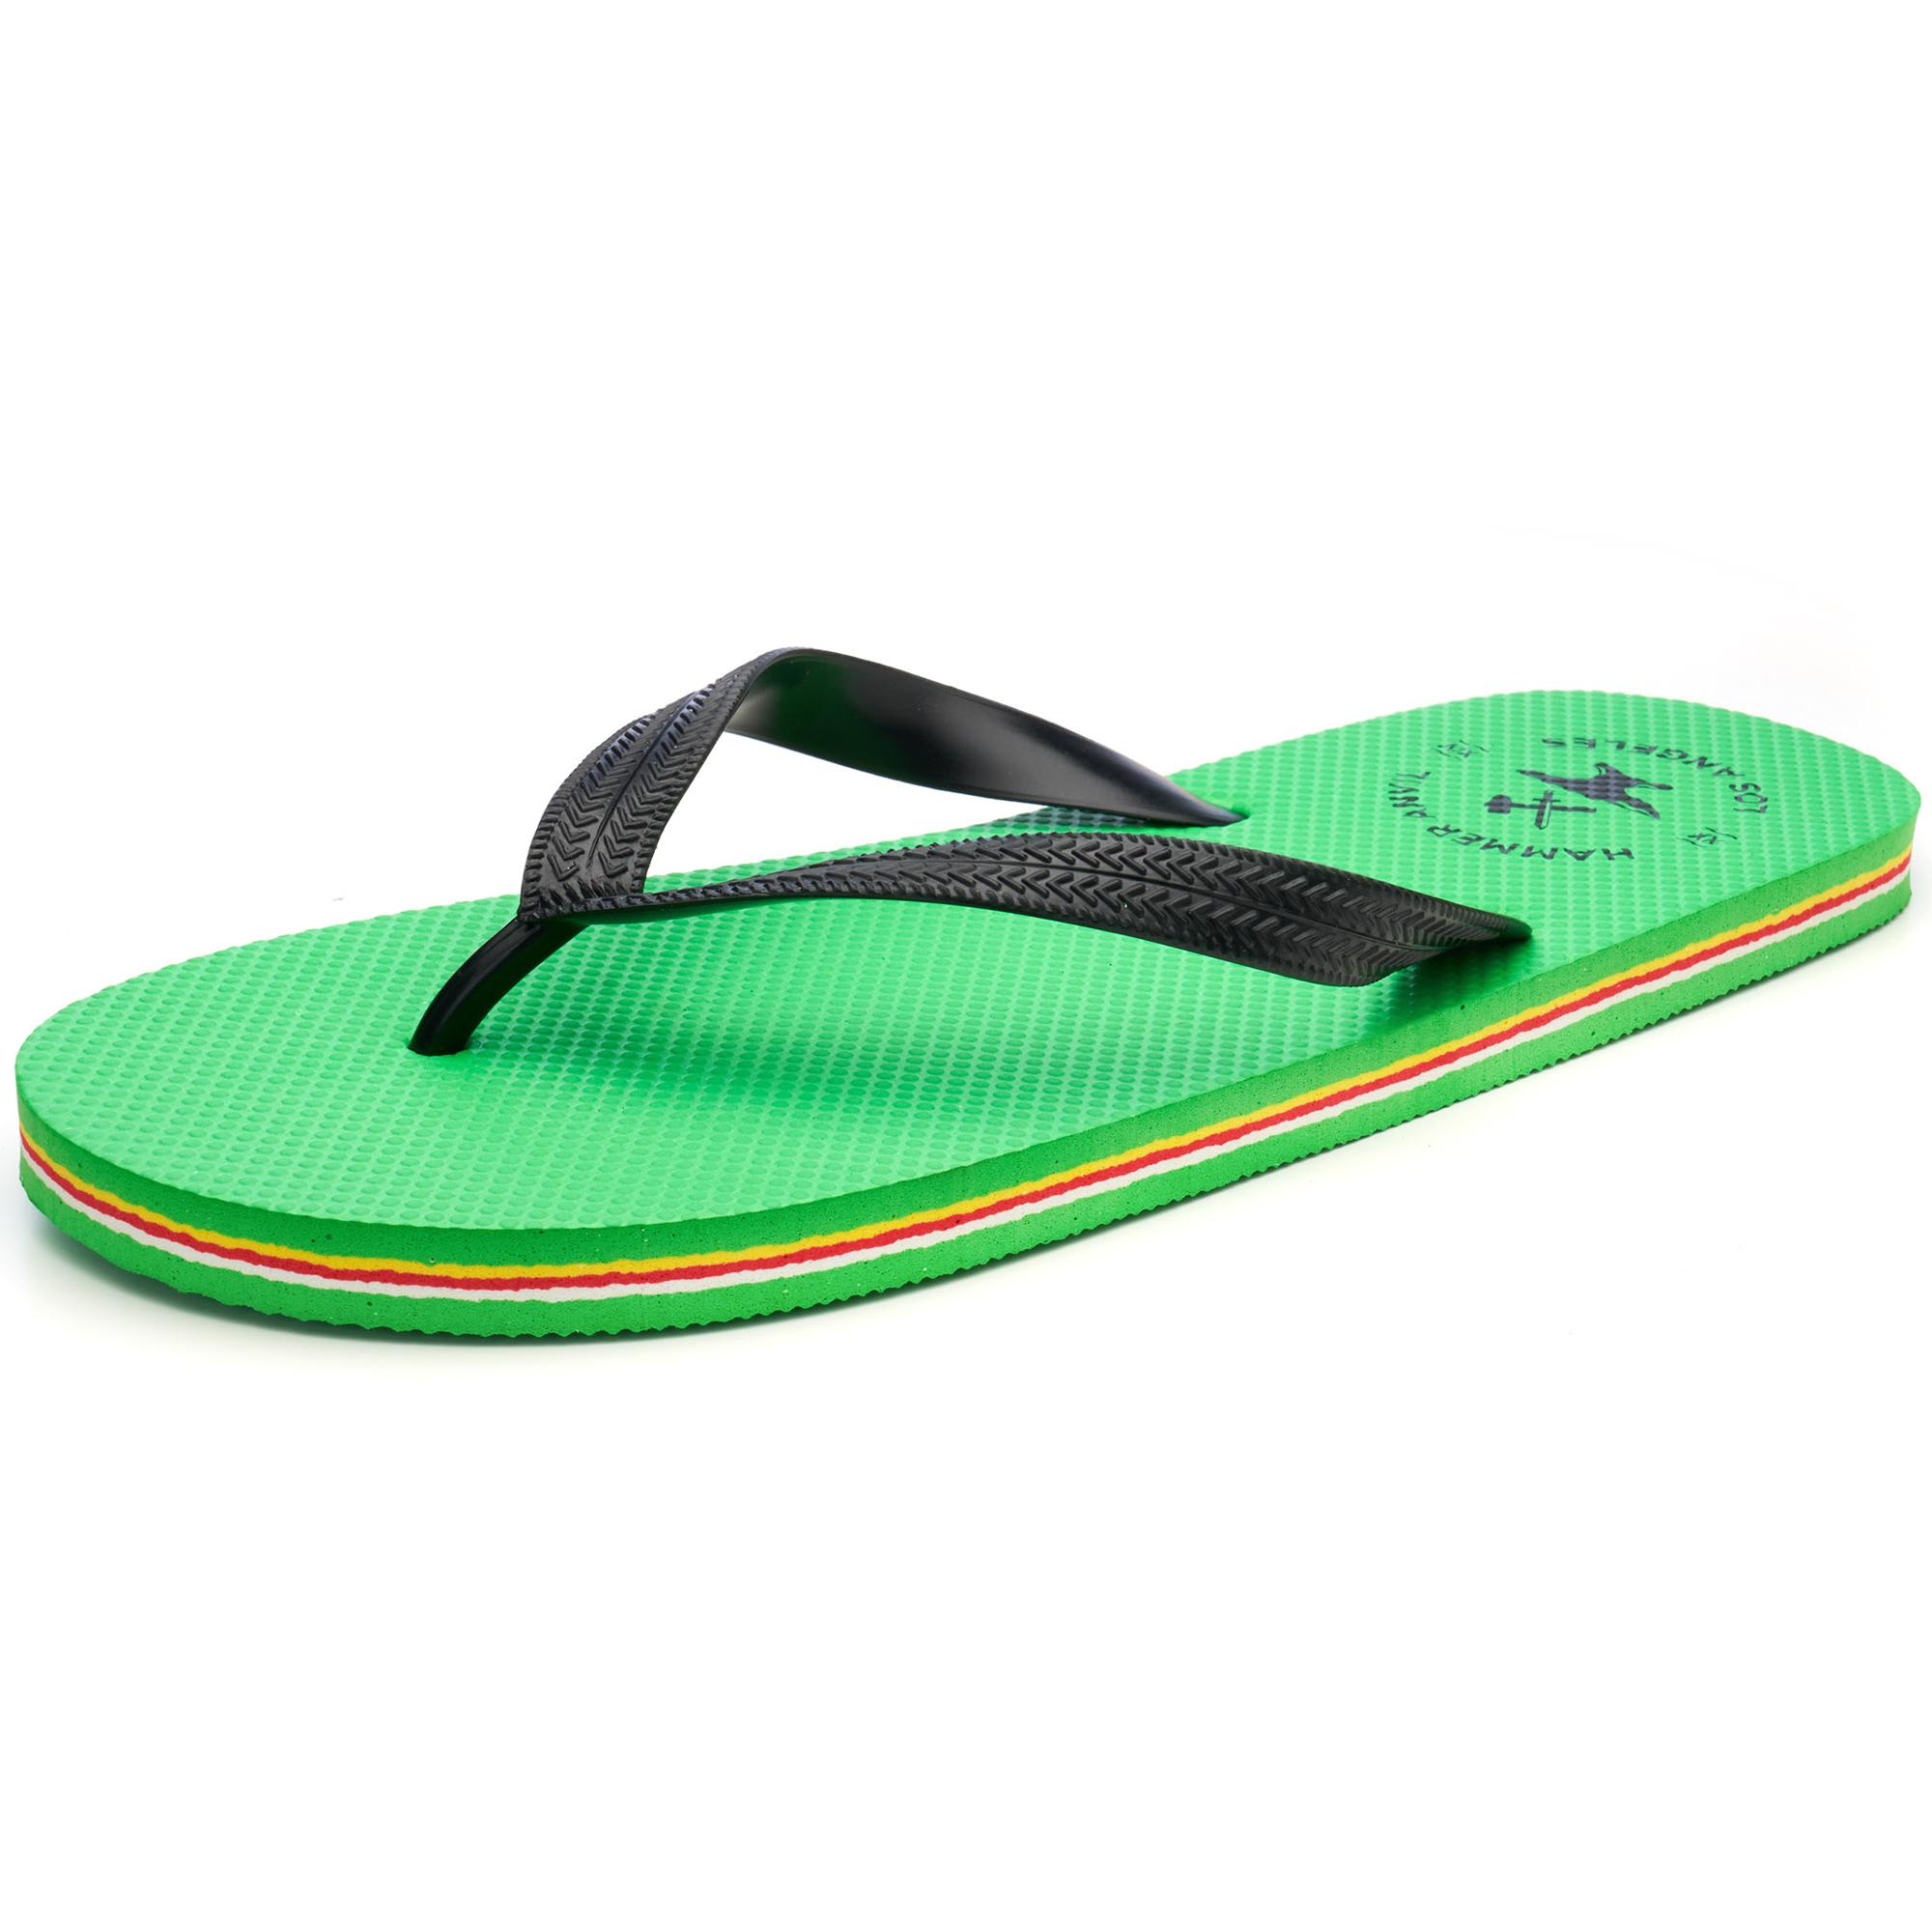 Hammer-Anvil-Mens-Flip-Flops-Casual-Thong-Summer-Sandals-Comfortable-Beach-Shoes thumbnail 20